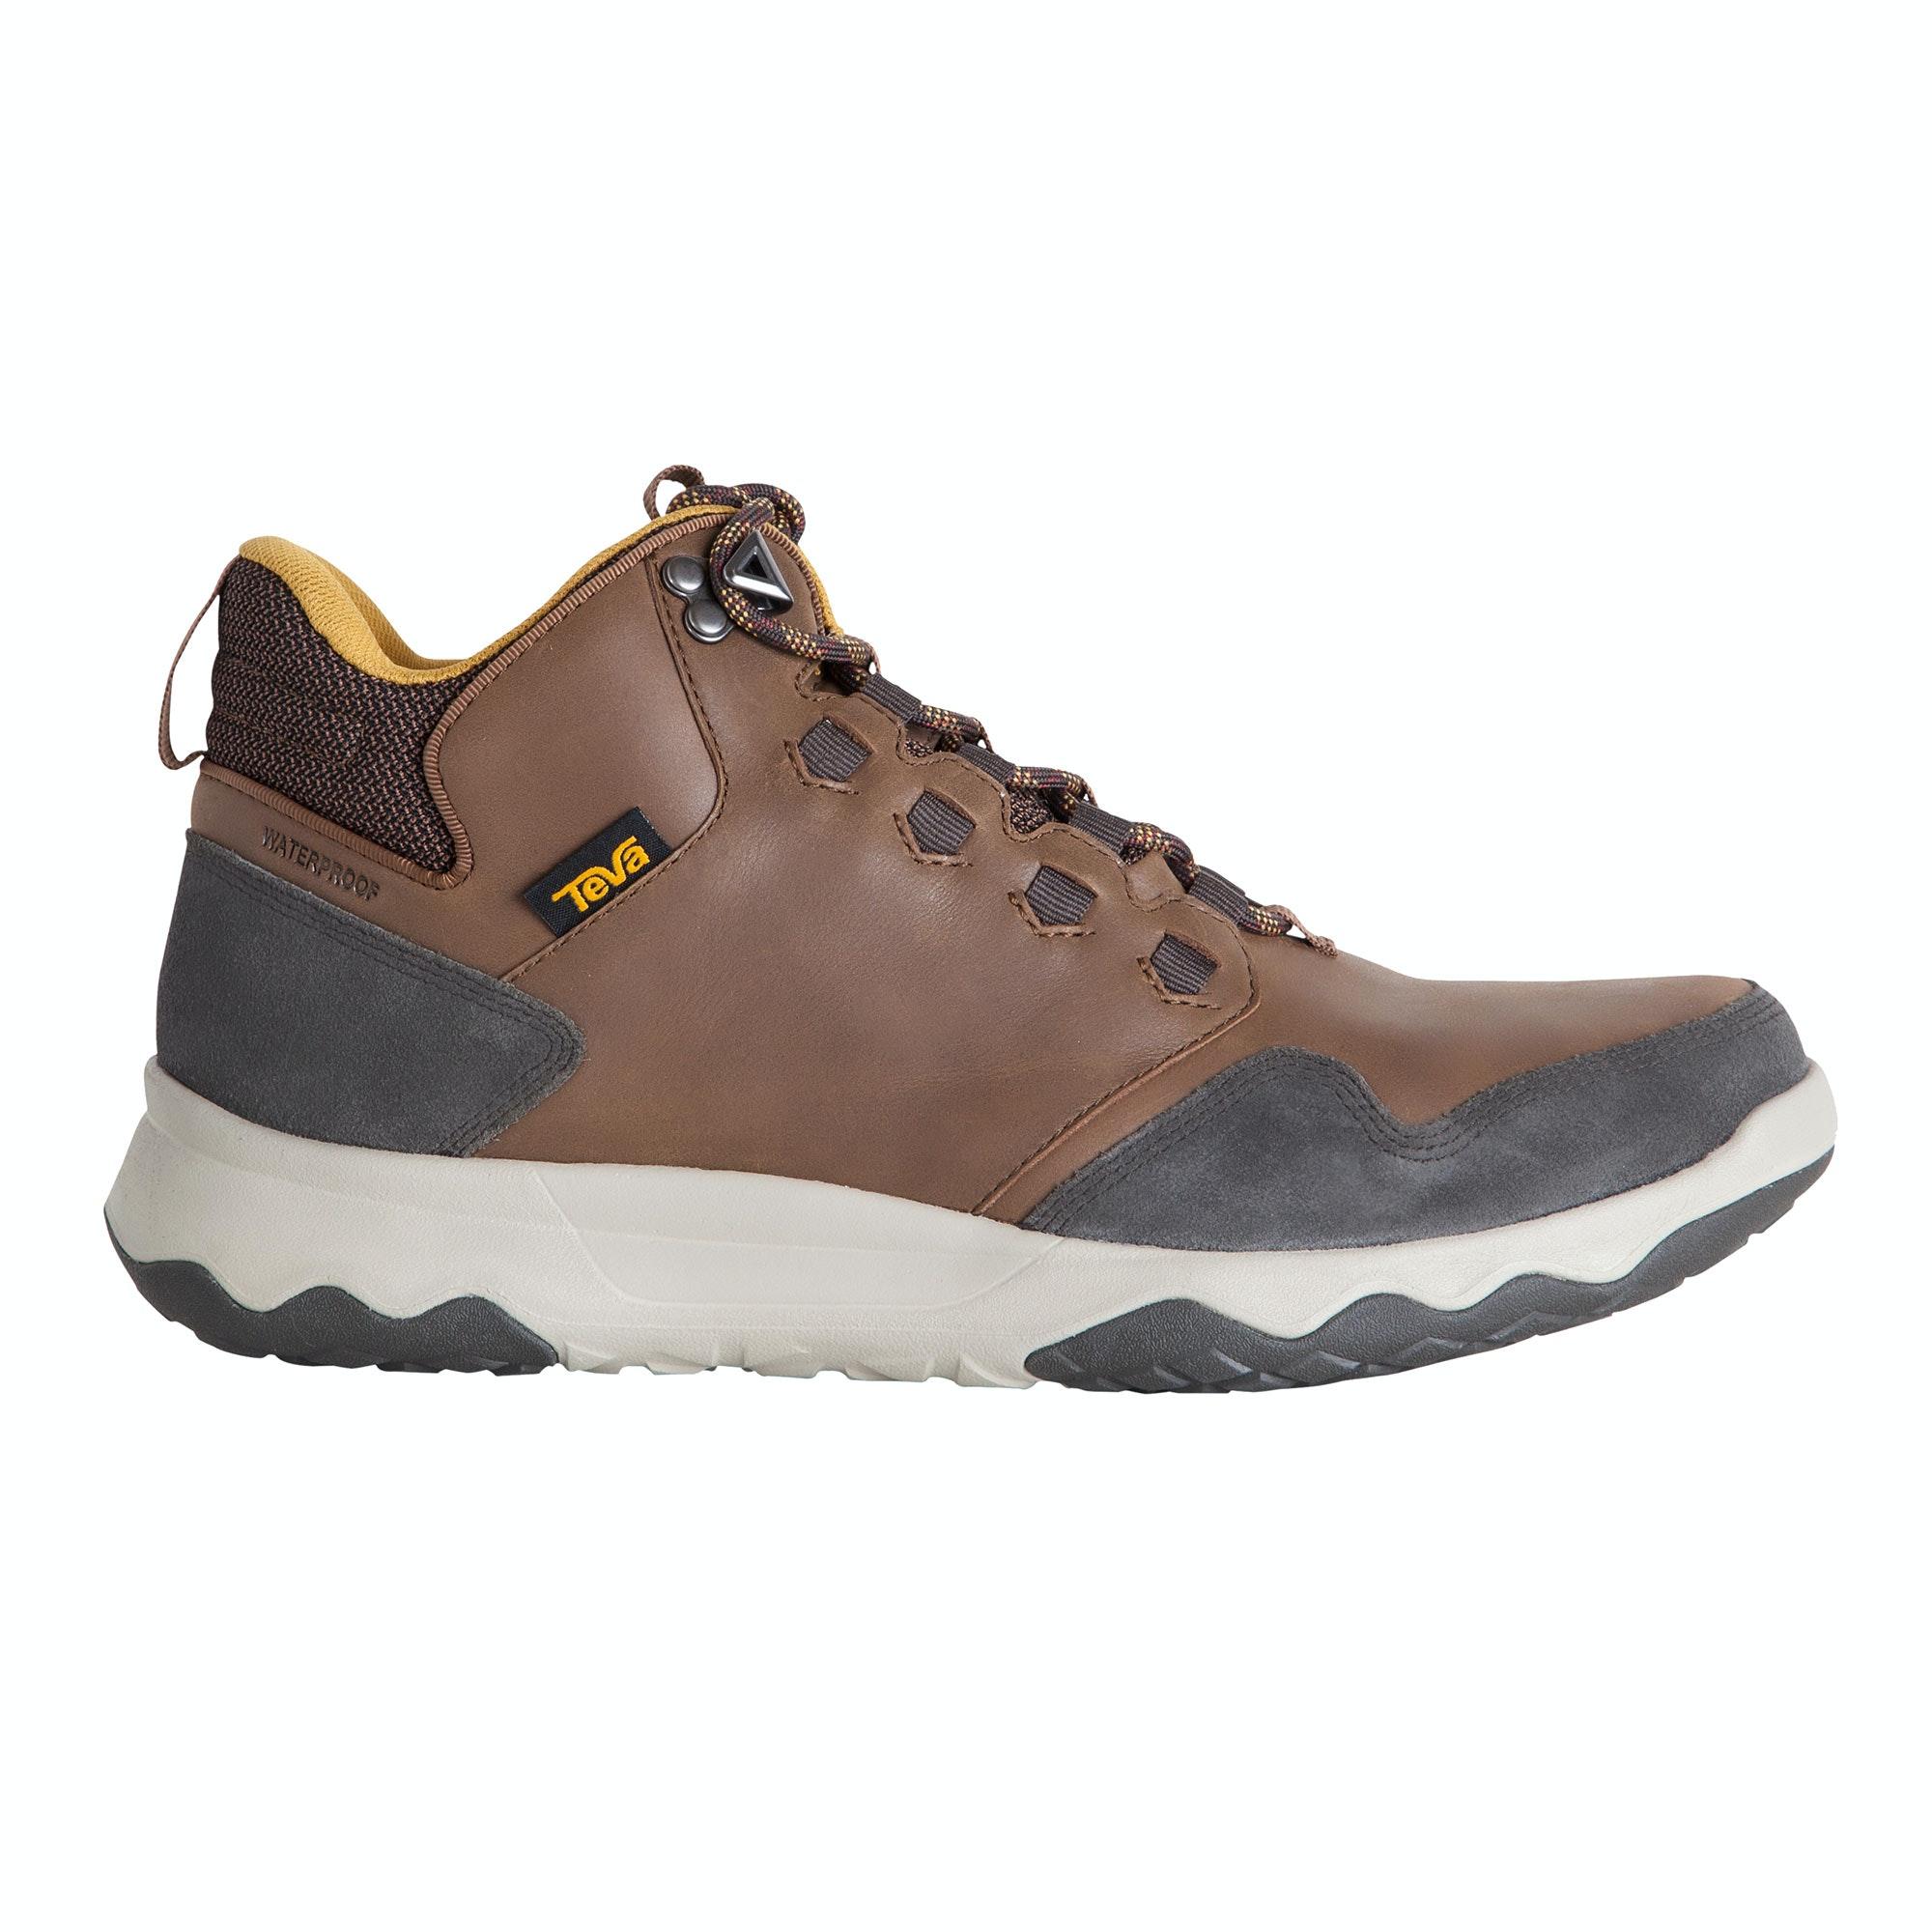 5d831168a965 Teva Arrowood Lux Mid Men s Water Proof Shoes - Brown